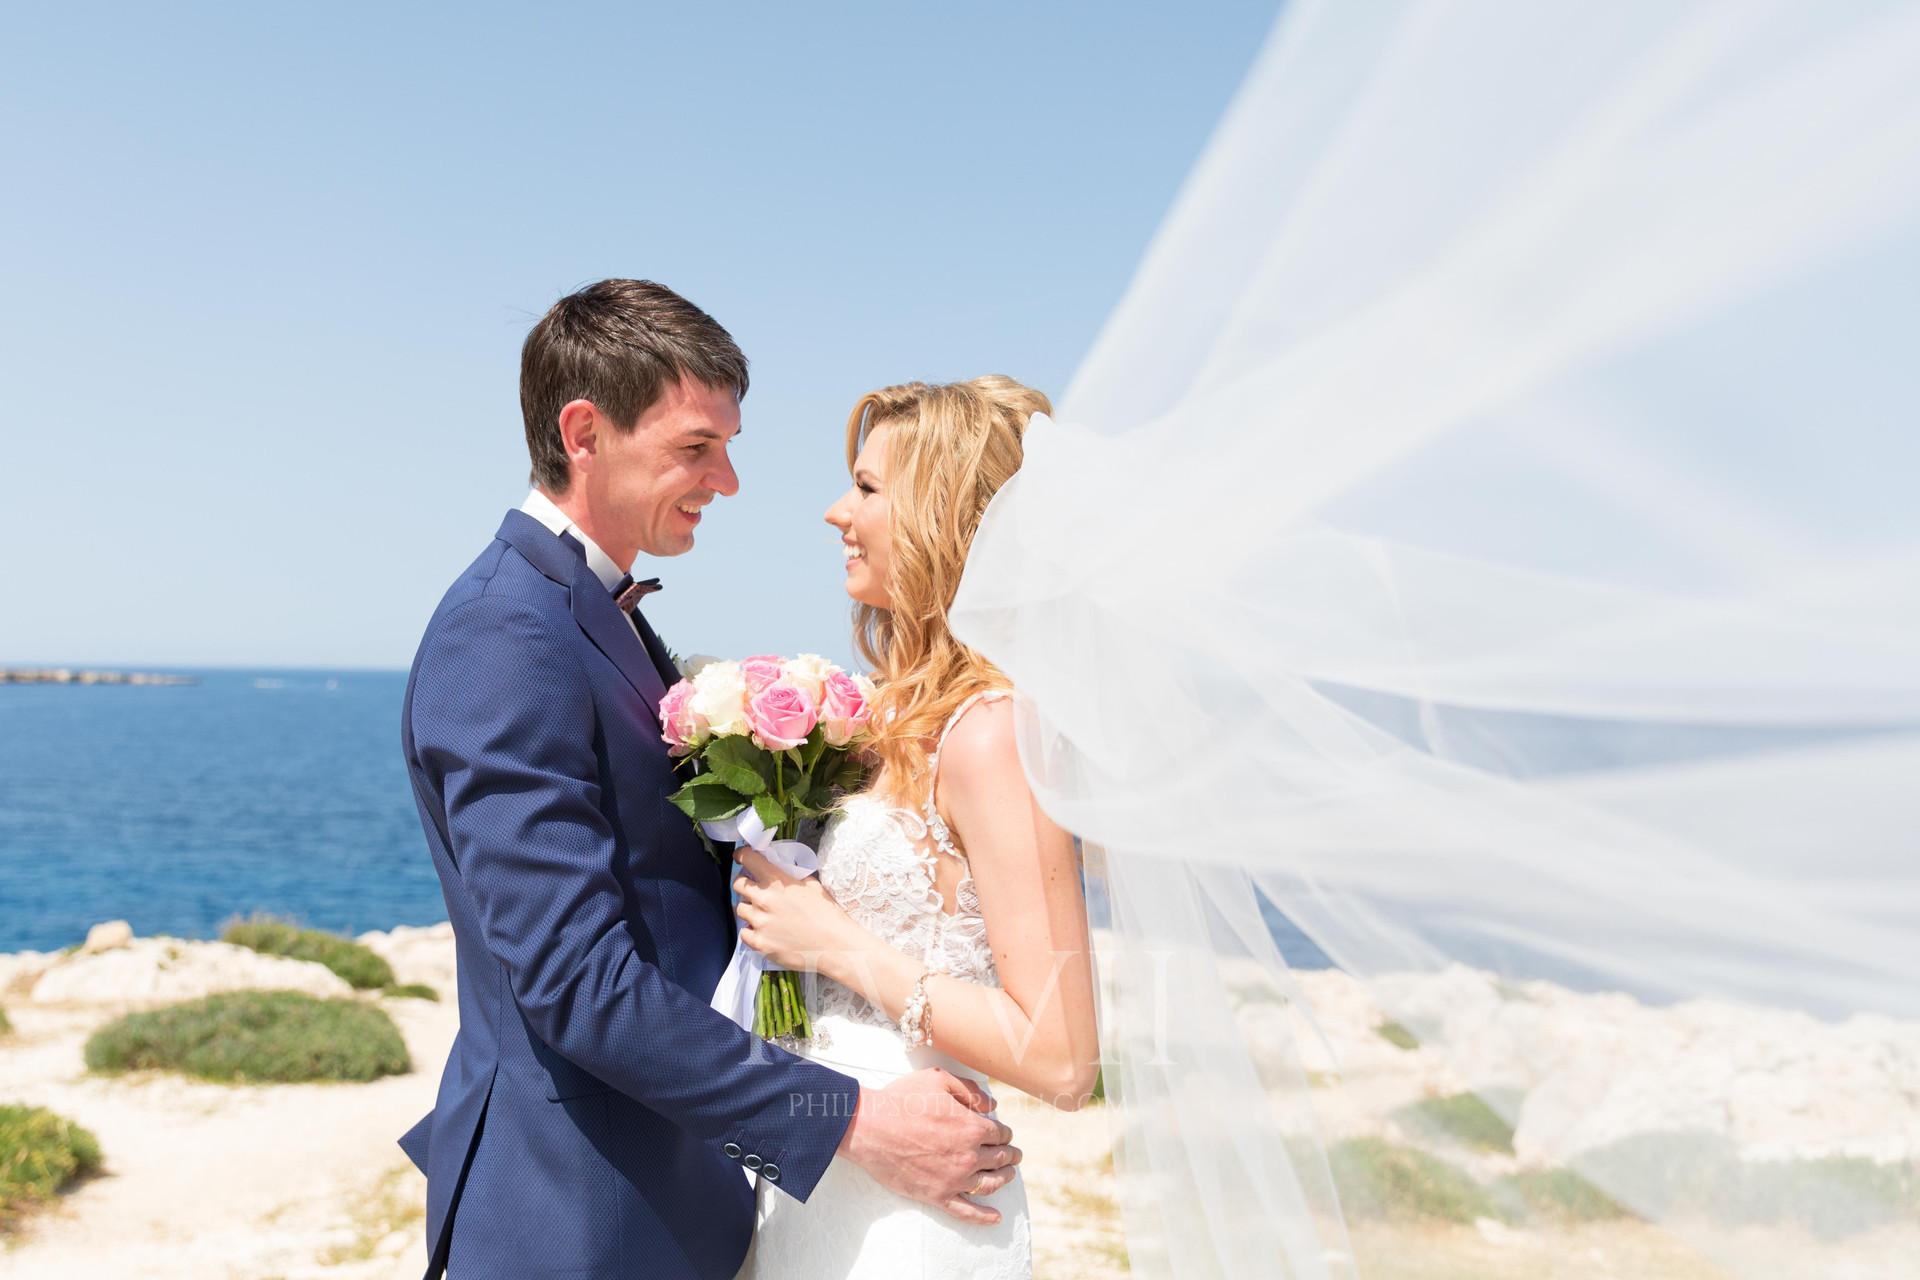 Gintare and Albertui Wedding-27.jpg